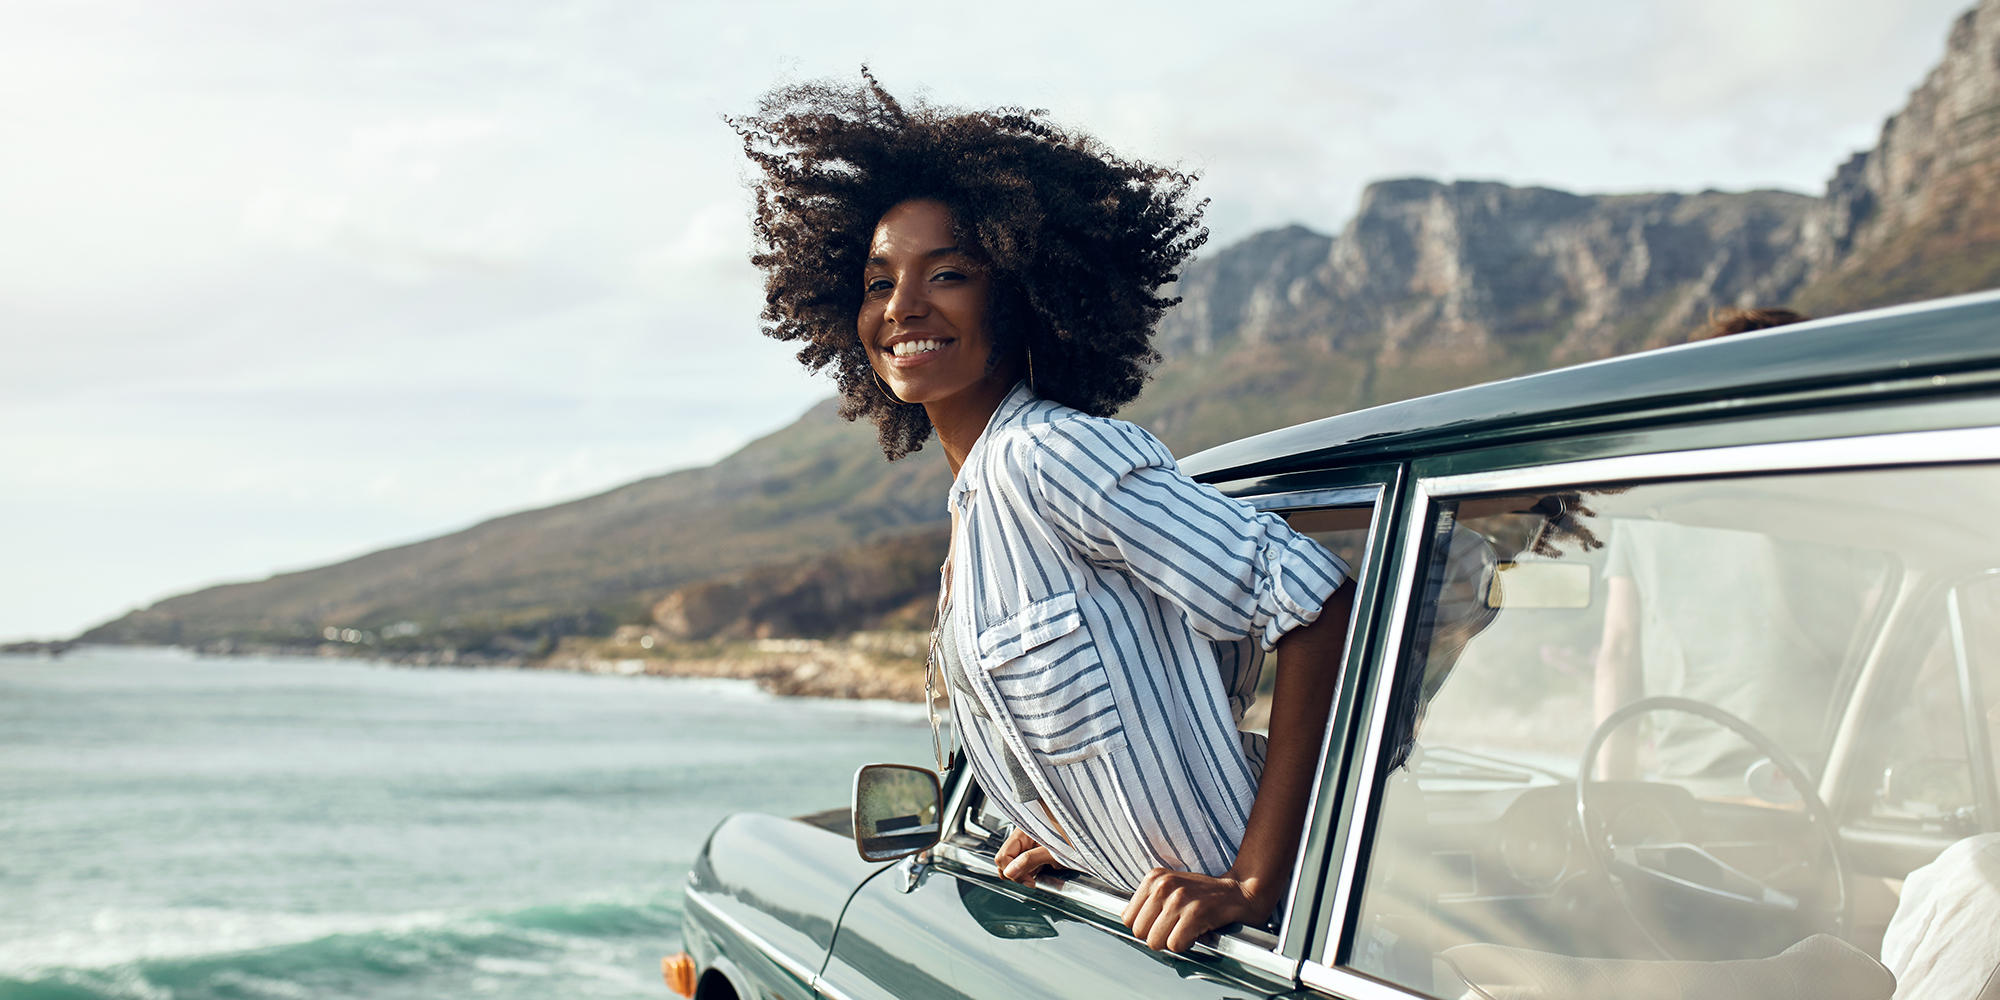 Woman hanging outside a car window - Upstart Personal Loans